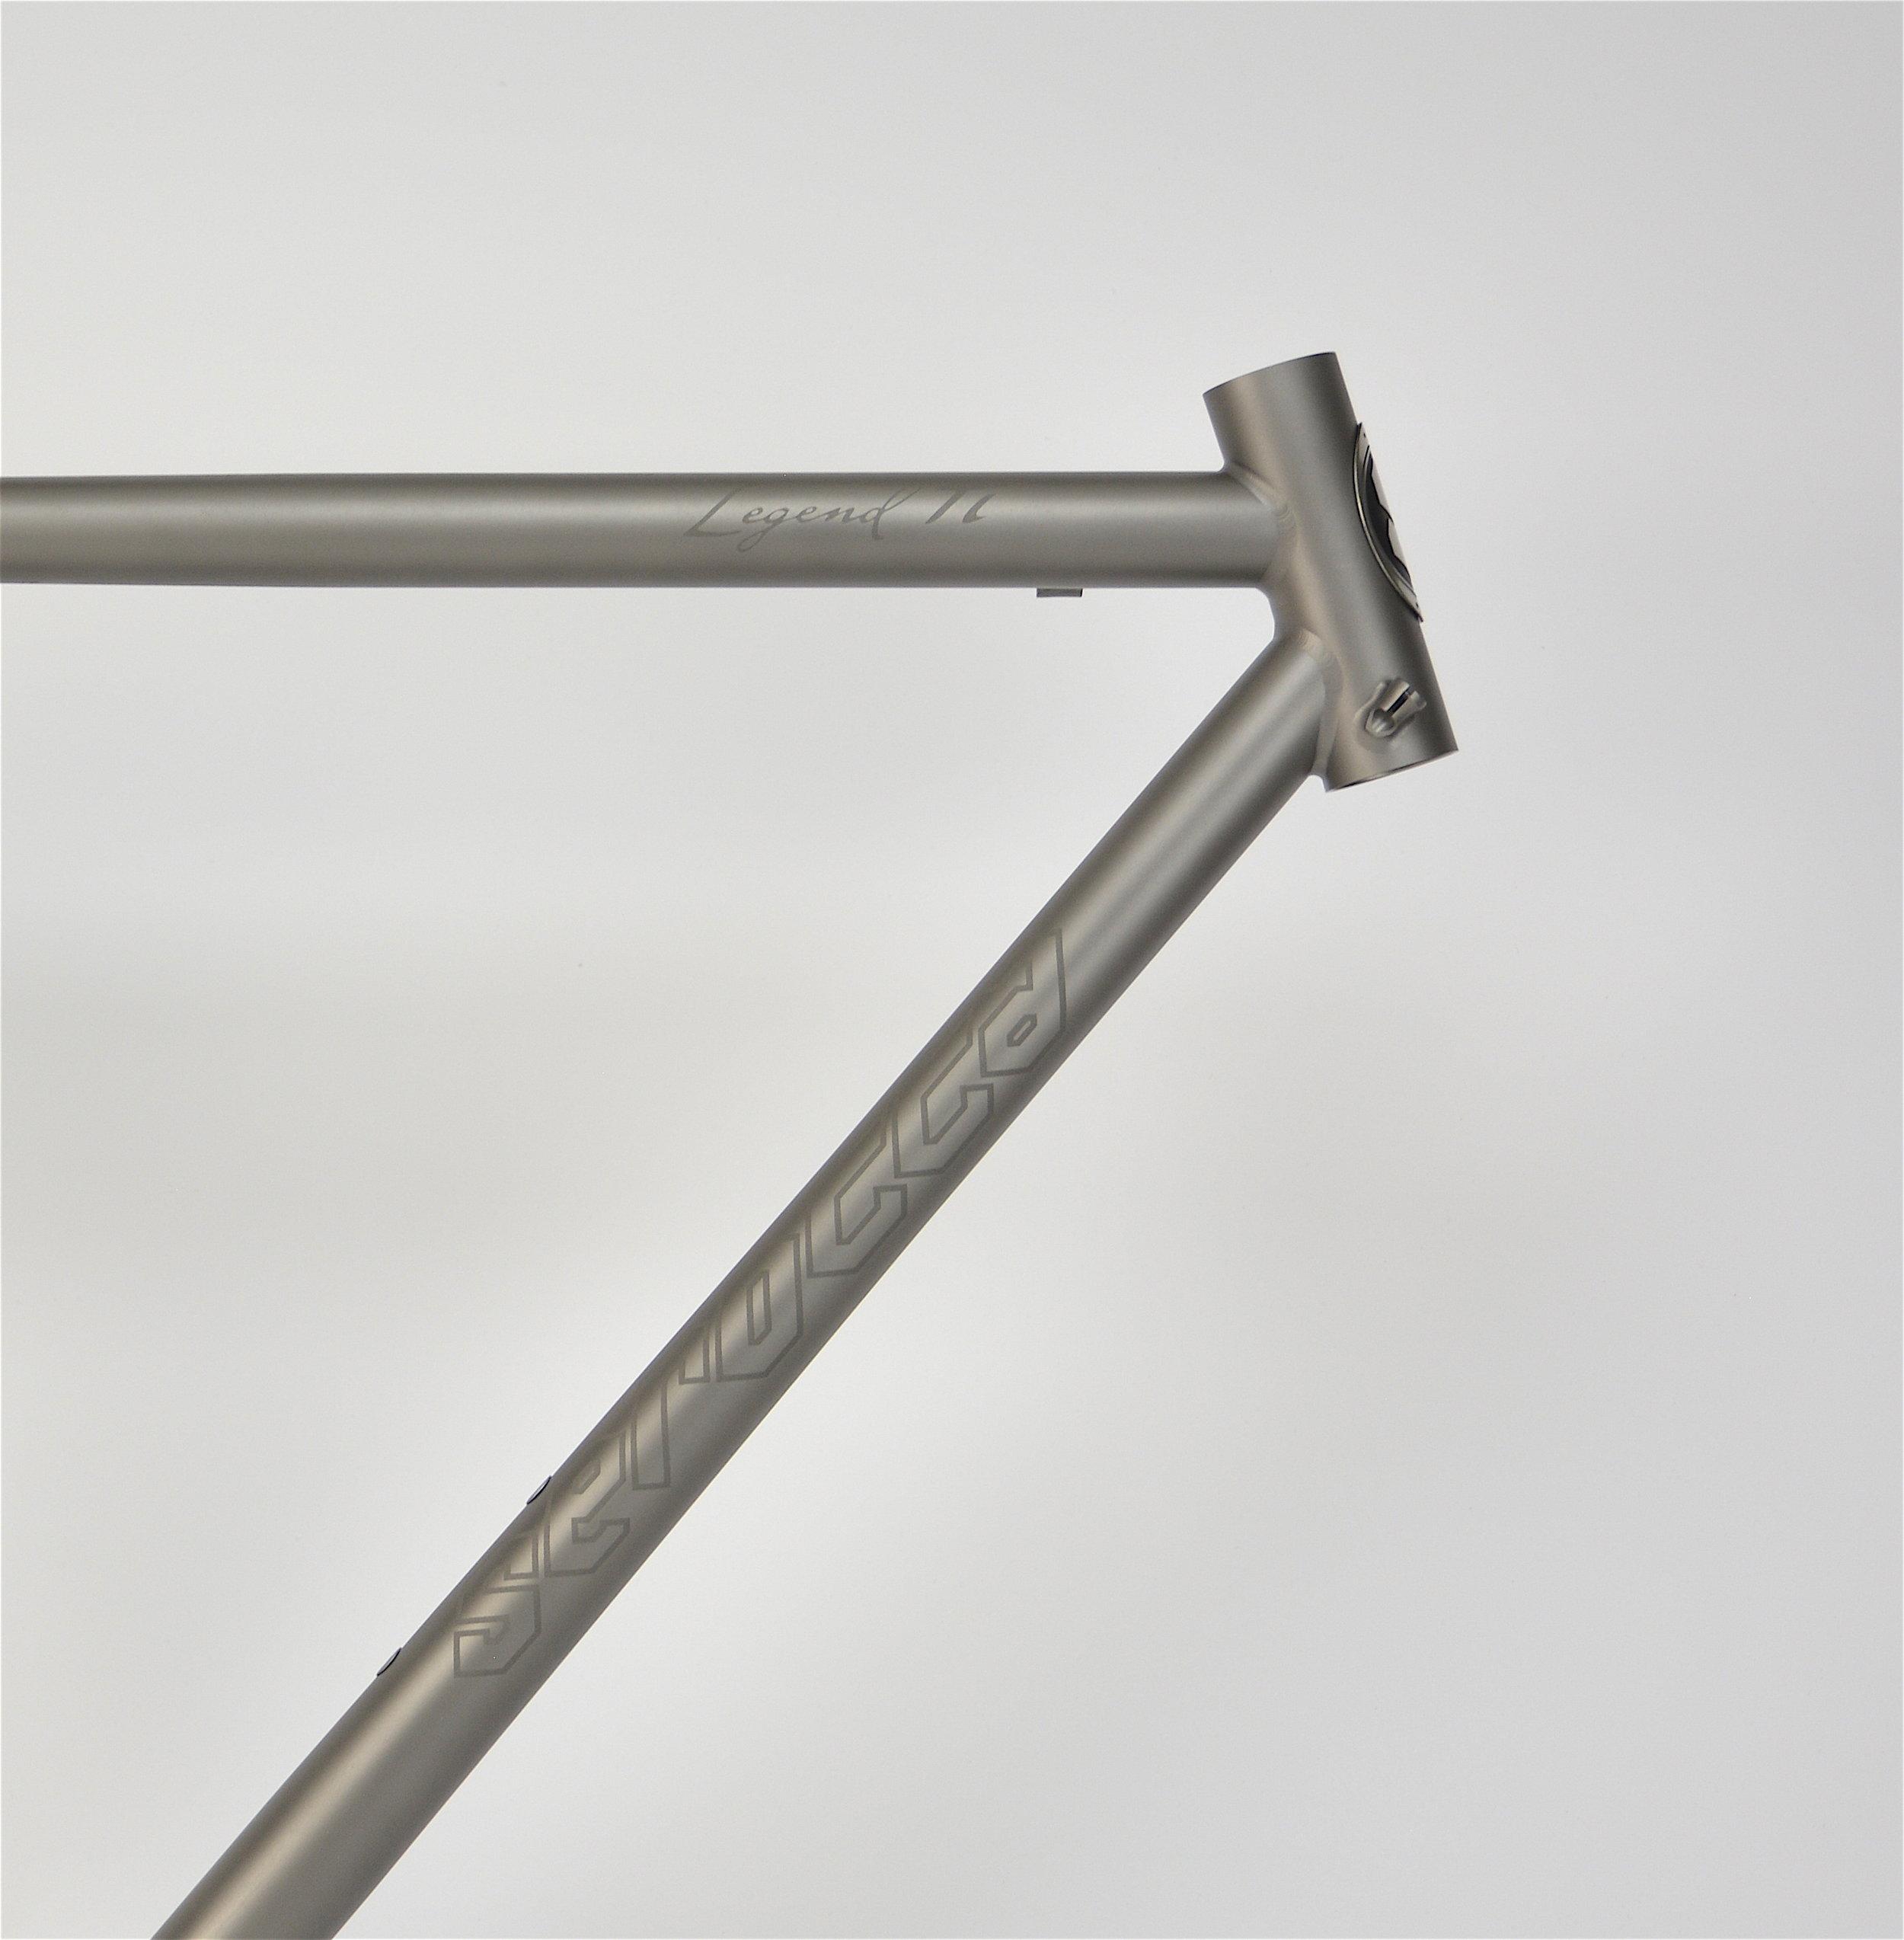 Titanium Etching and Refinishing